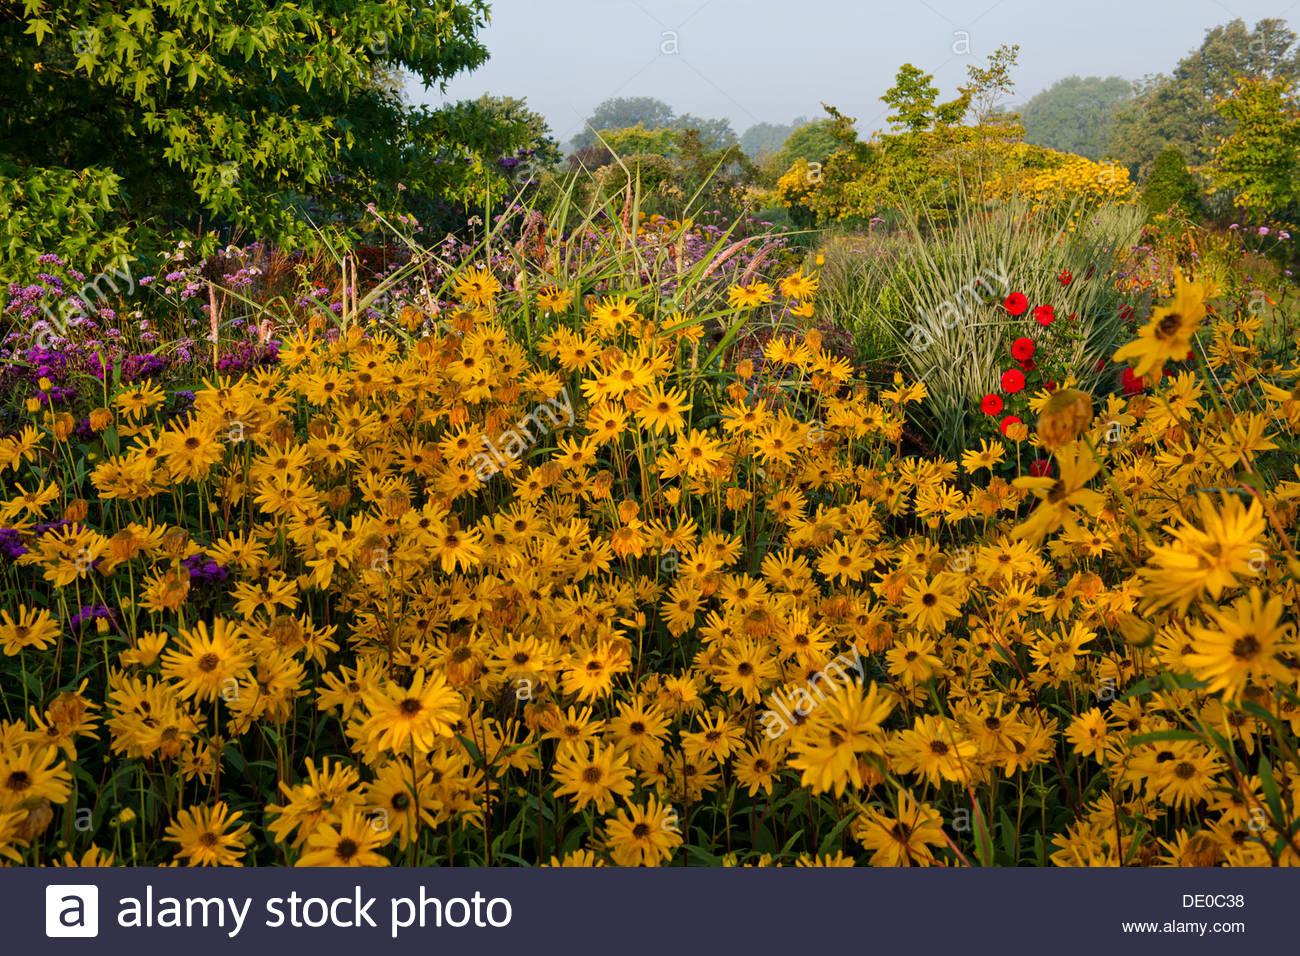 Helianthus atrorubens Monarch purpledisk sunflower Merriments East Sussex late summer garden border combination September sun - Stock Image